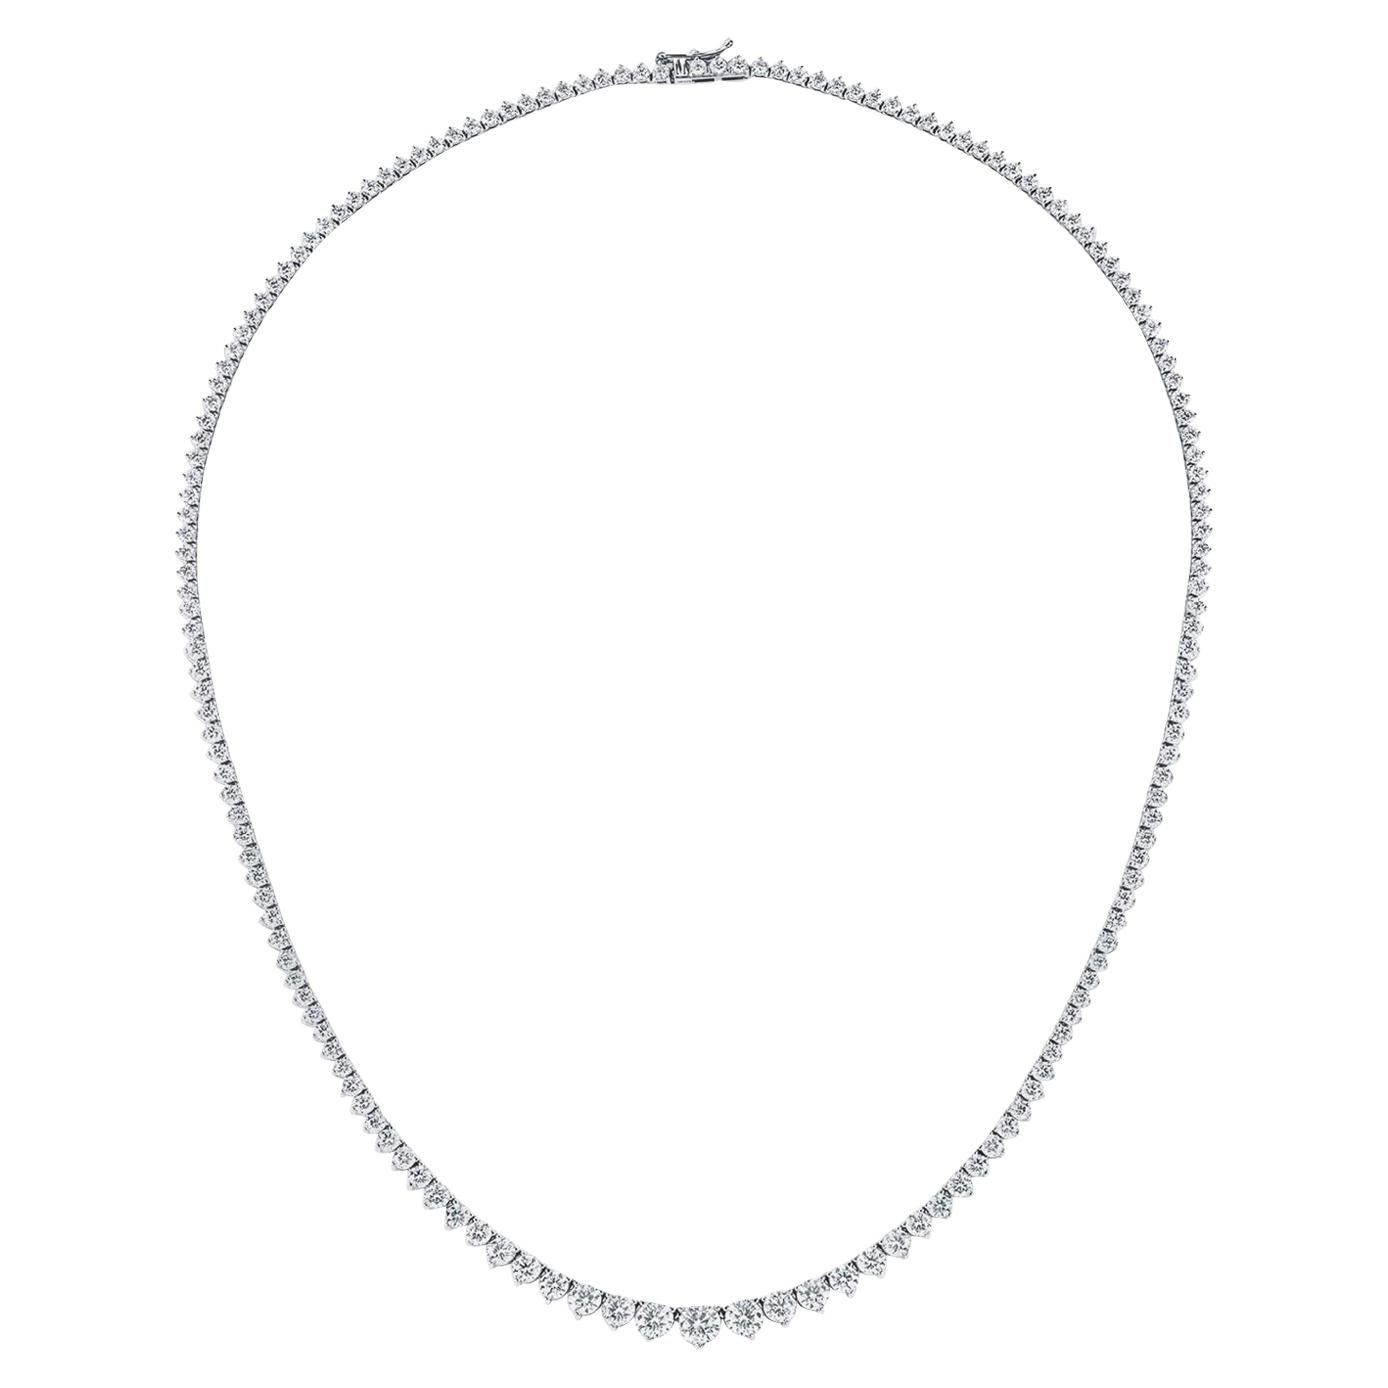 GIA Certified 10.67 Carat Diamond Graduated Riviera Necklace